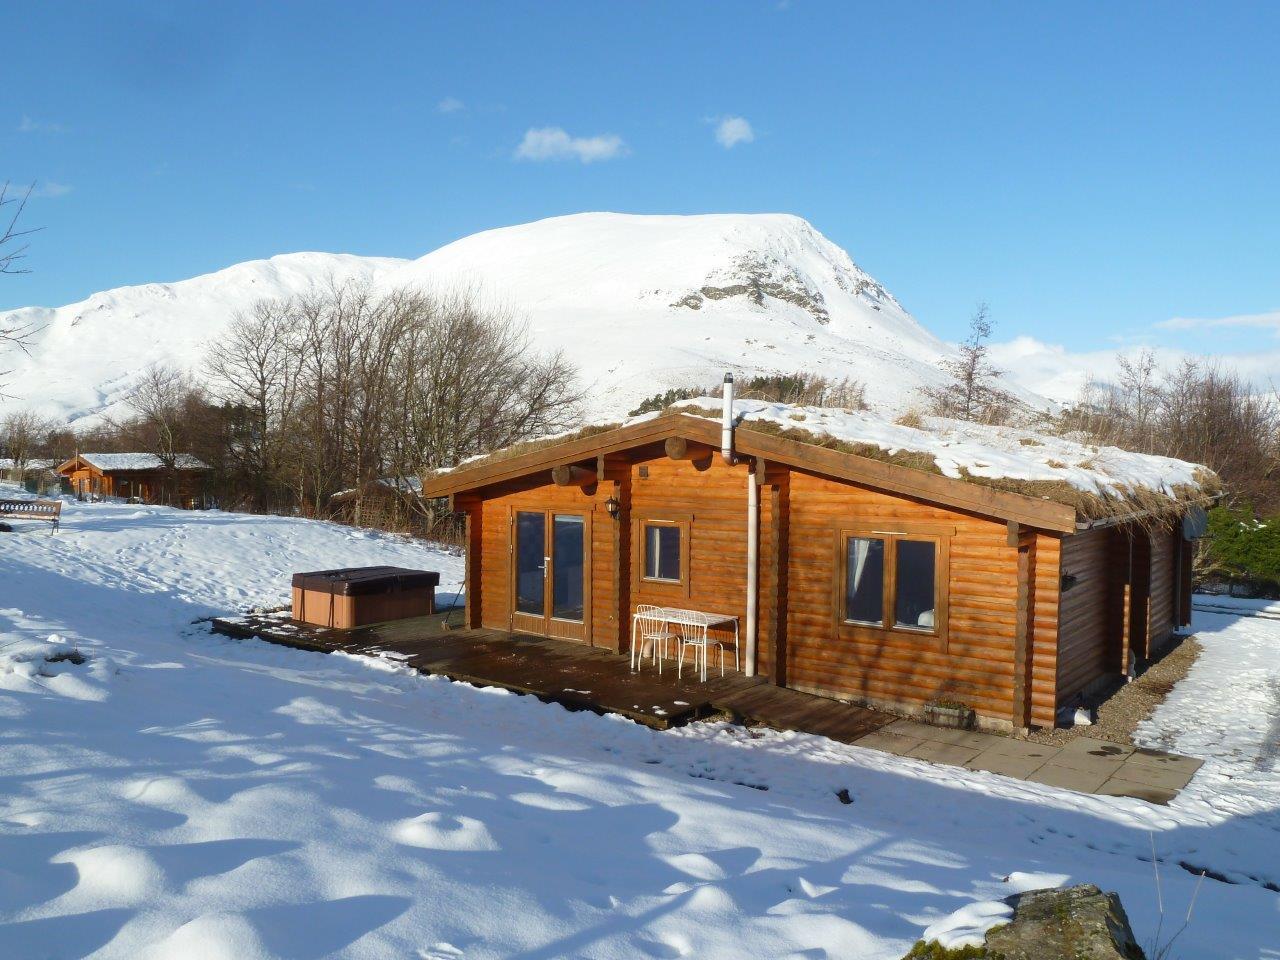 Cragdhu Log Cabin Winter